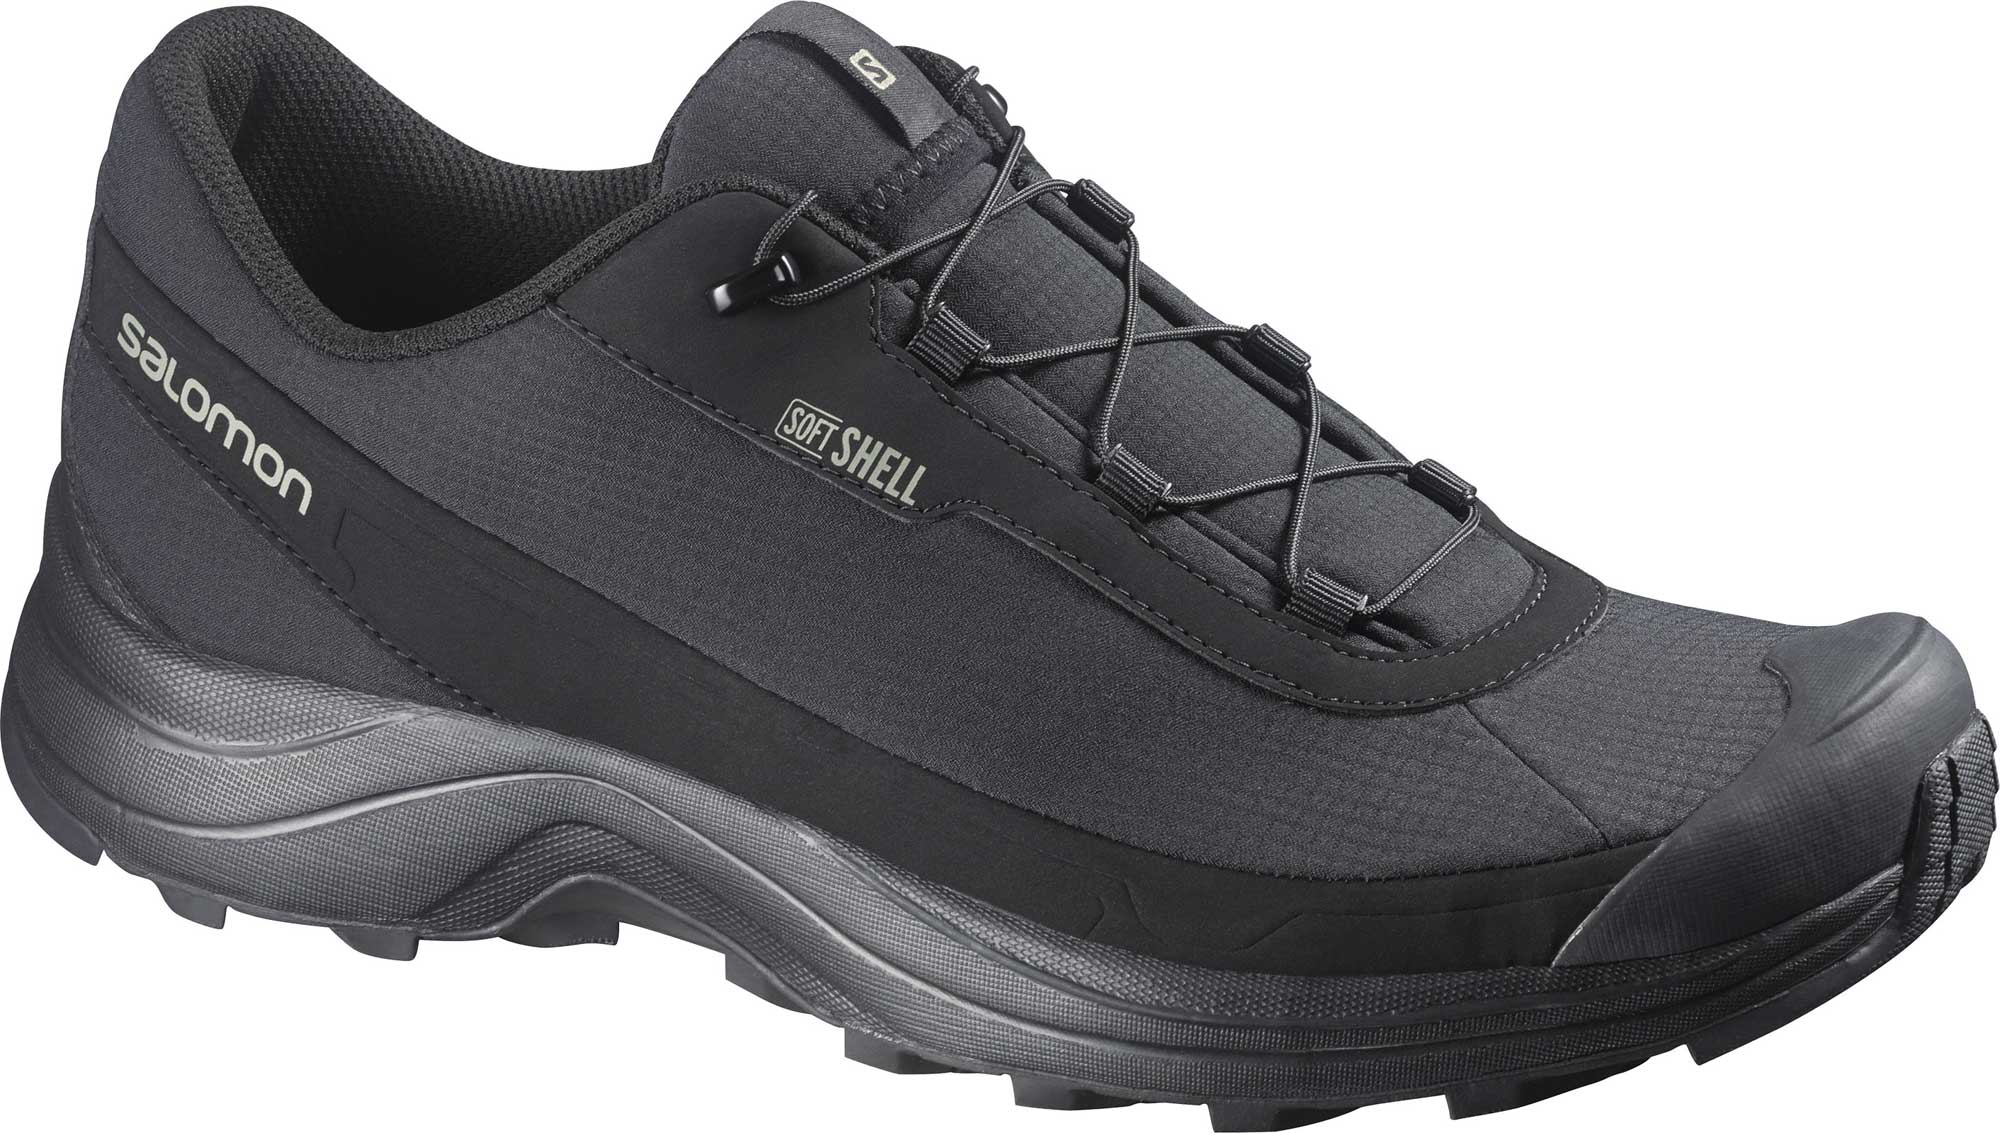 4d12a0abfb3 Pánská outdoorová obuv